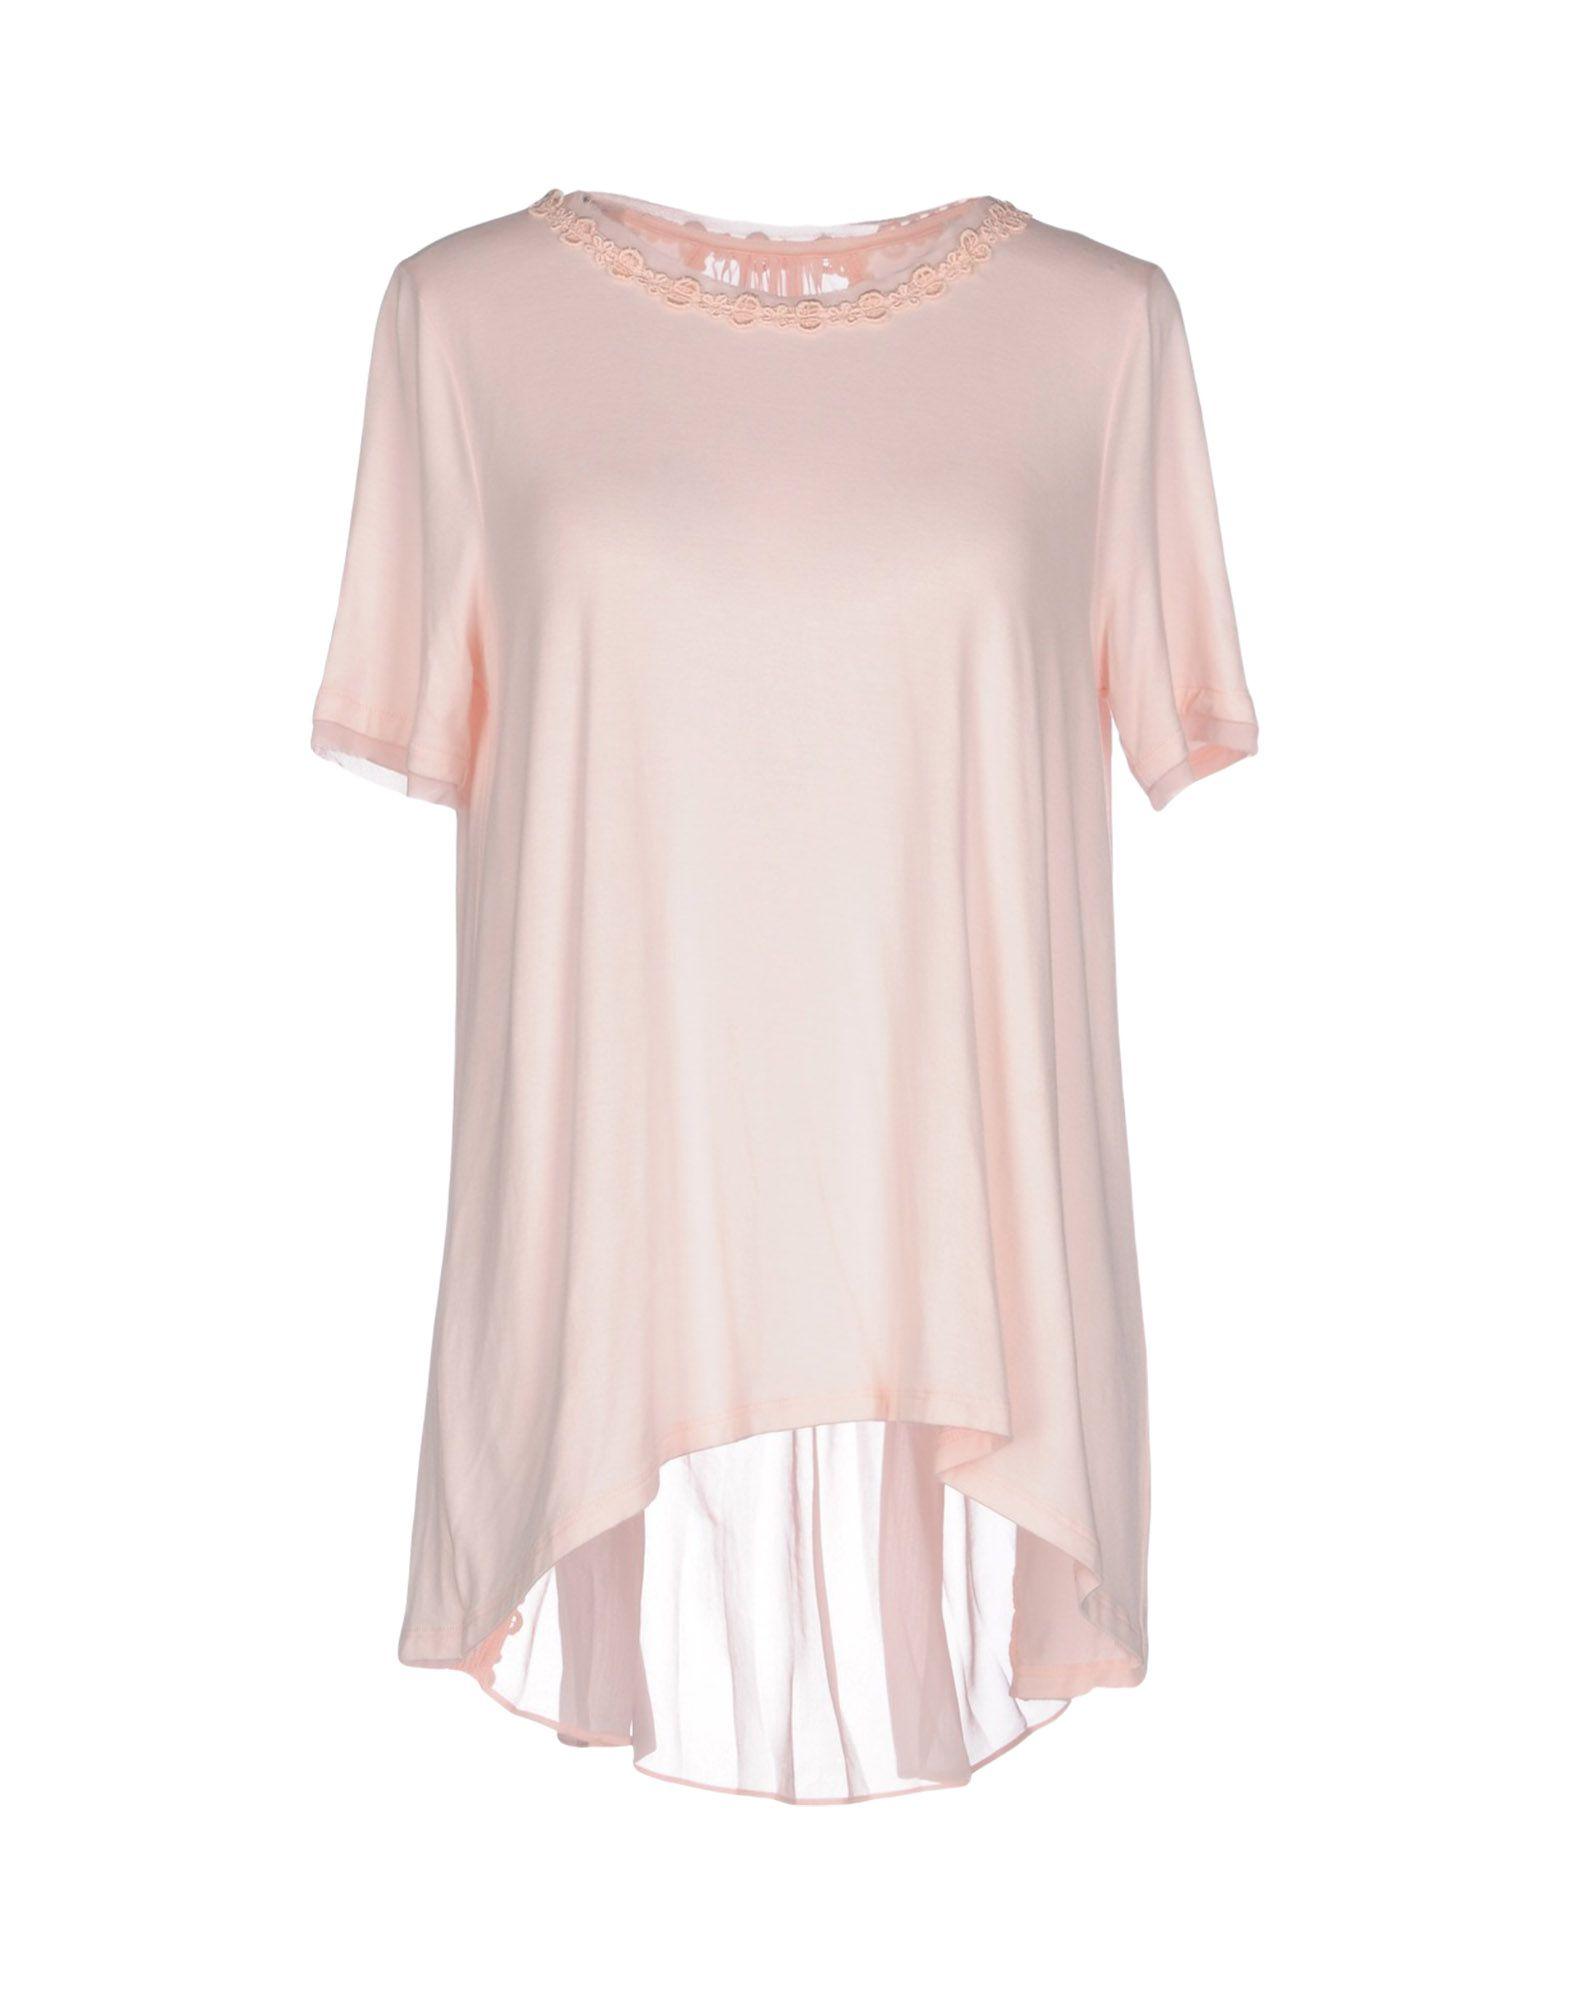 ELIE TAHARI Damen Bluse Farbe Rosa Größe 7